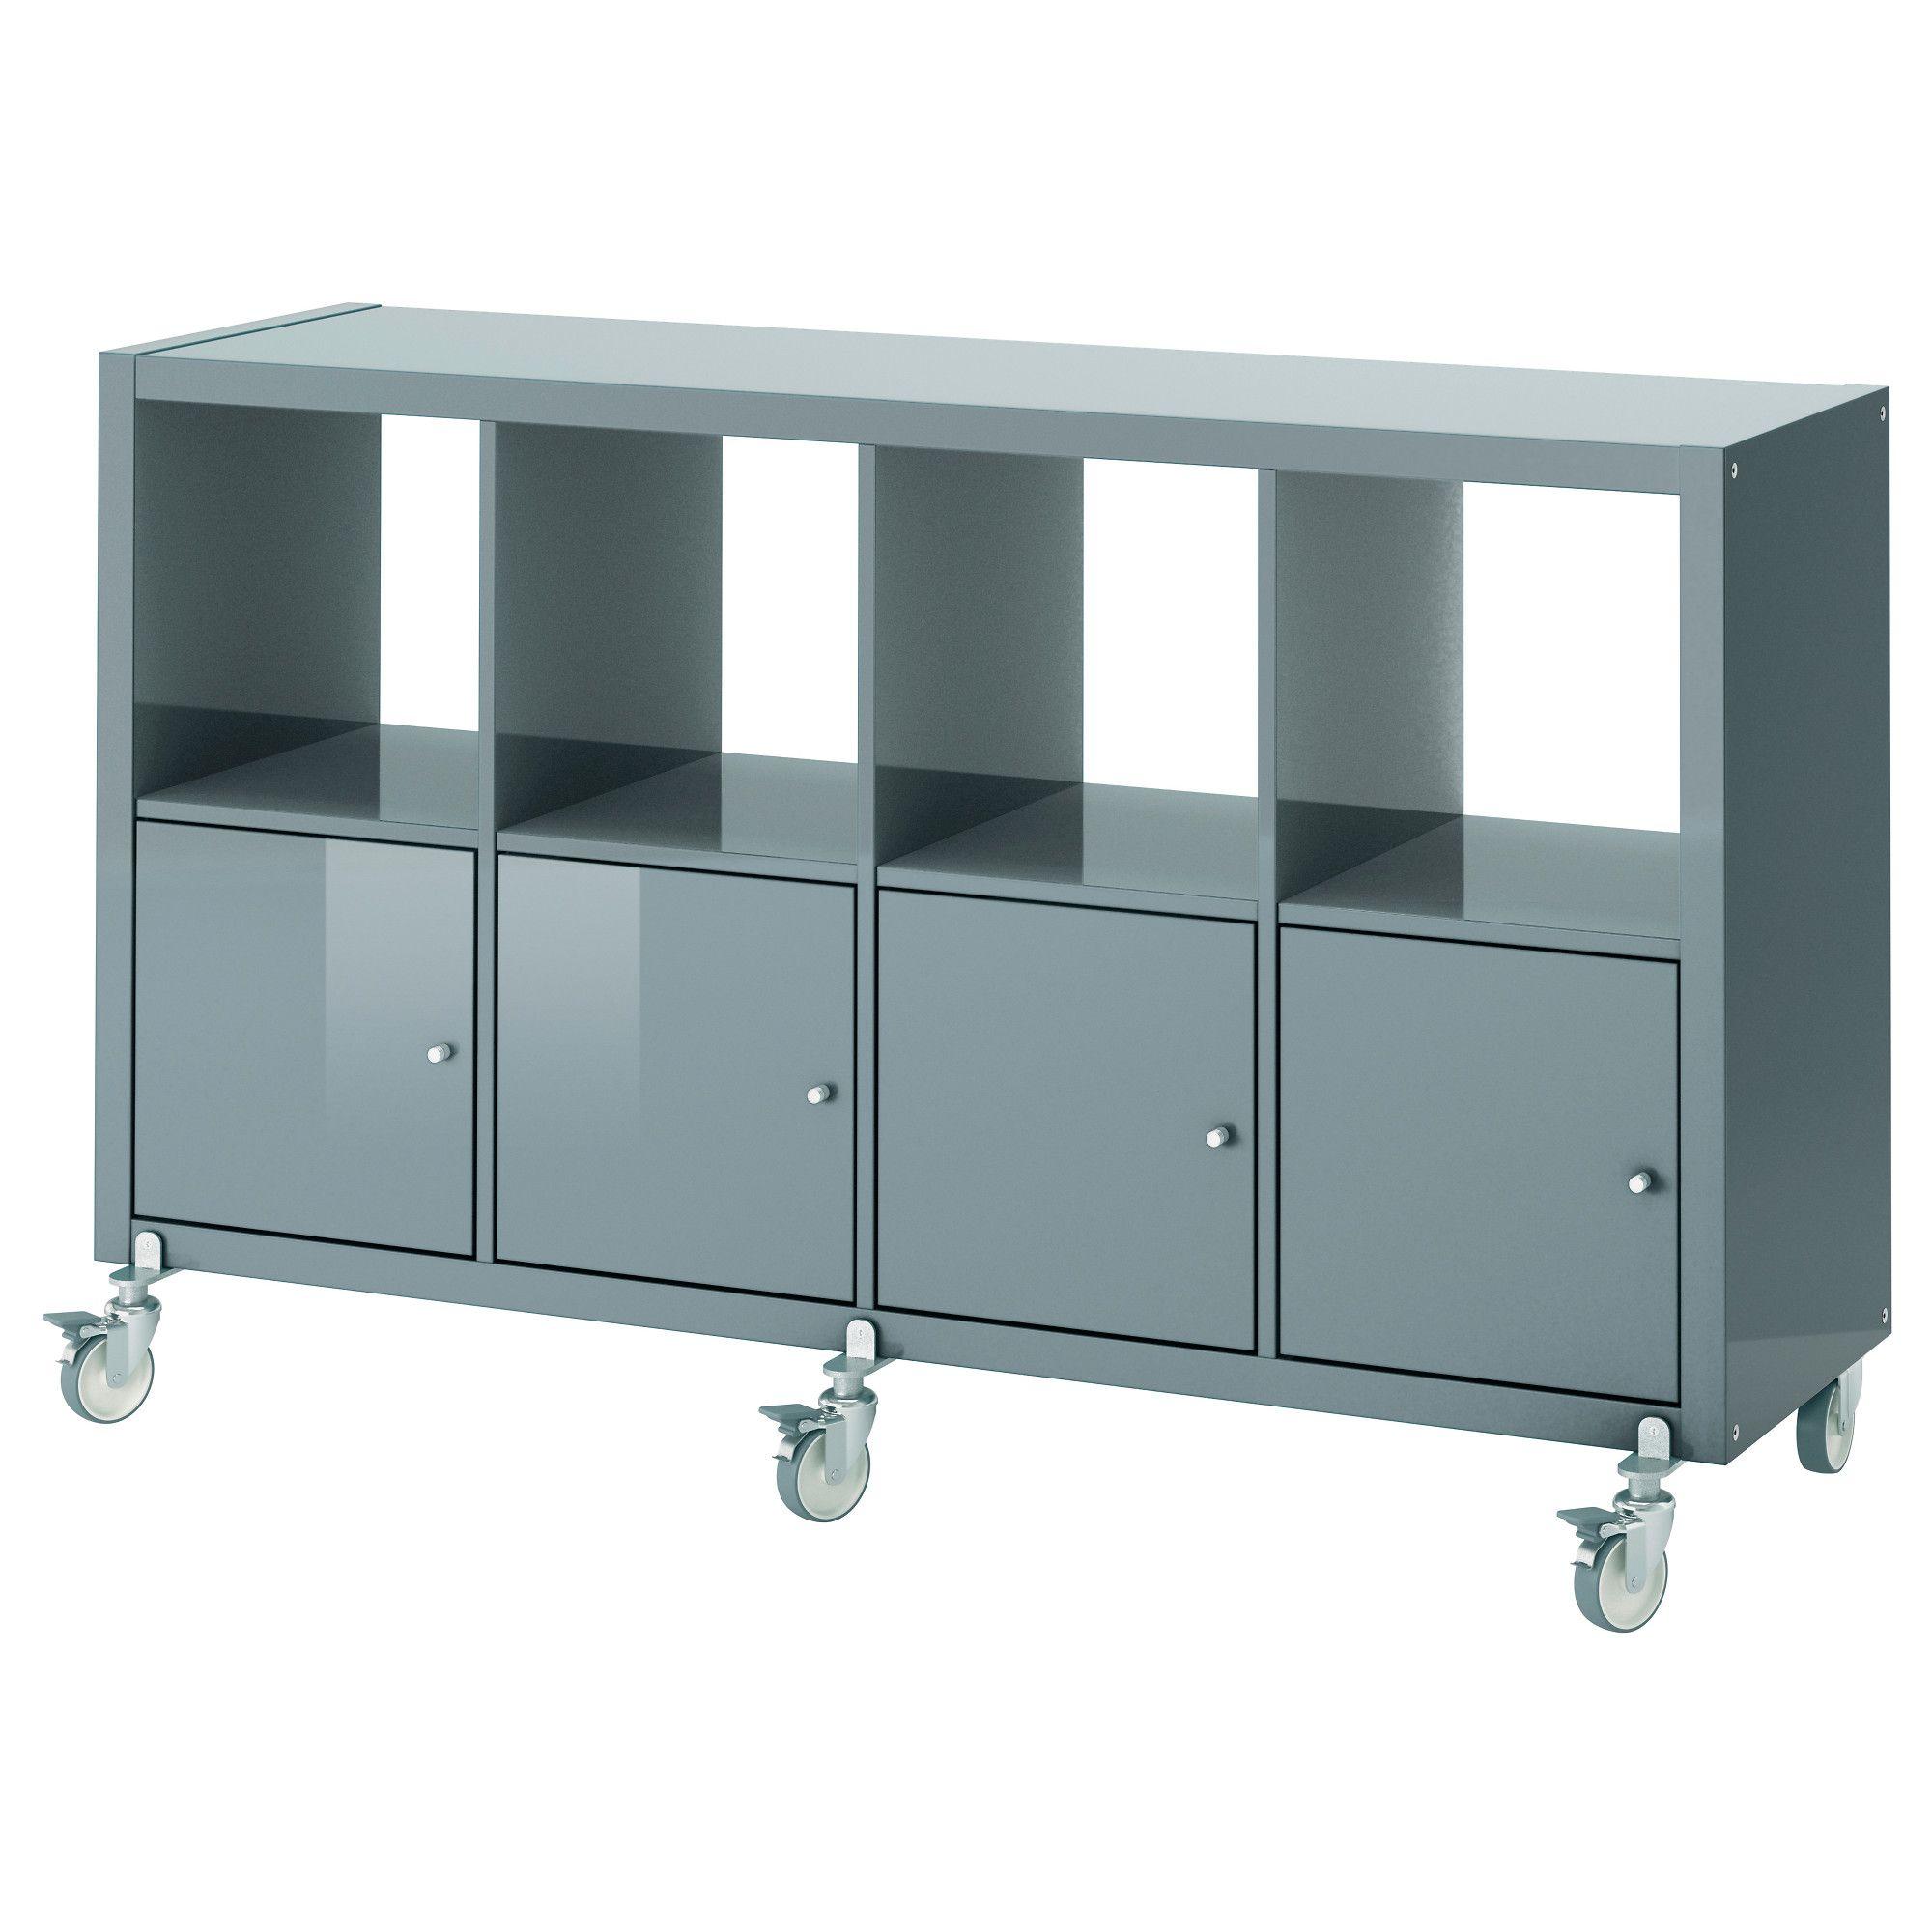 Ikea De Catalog Products S69197400